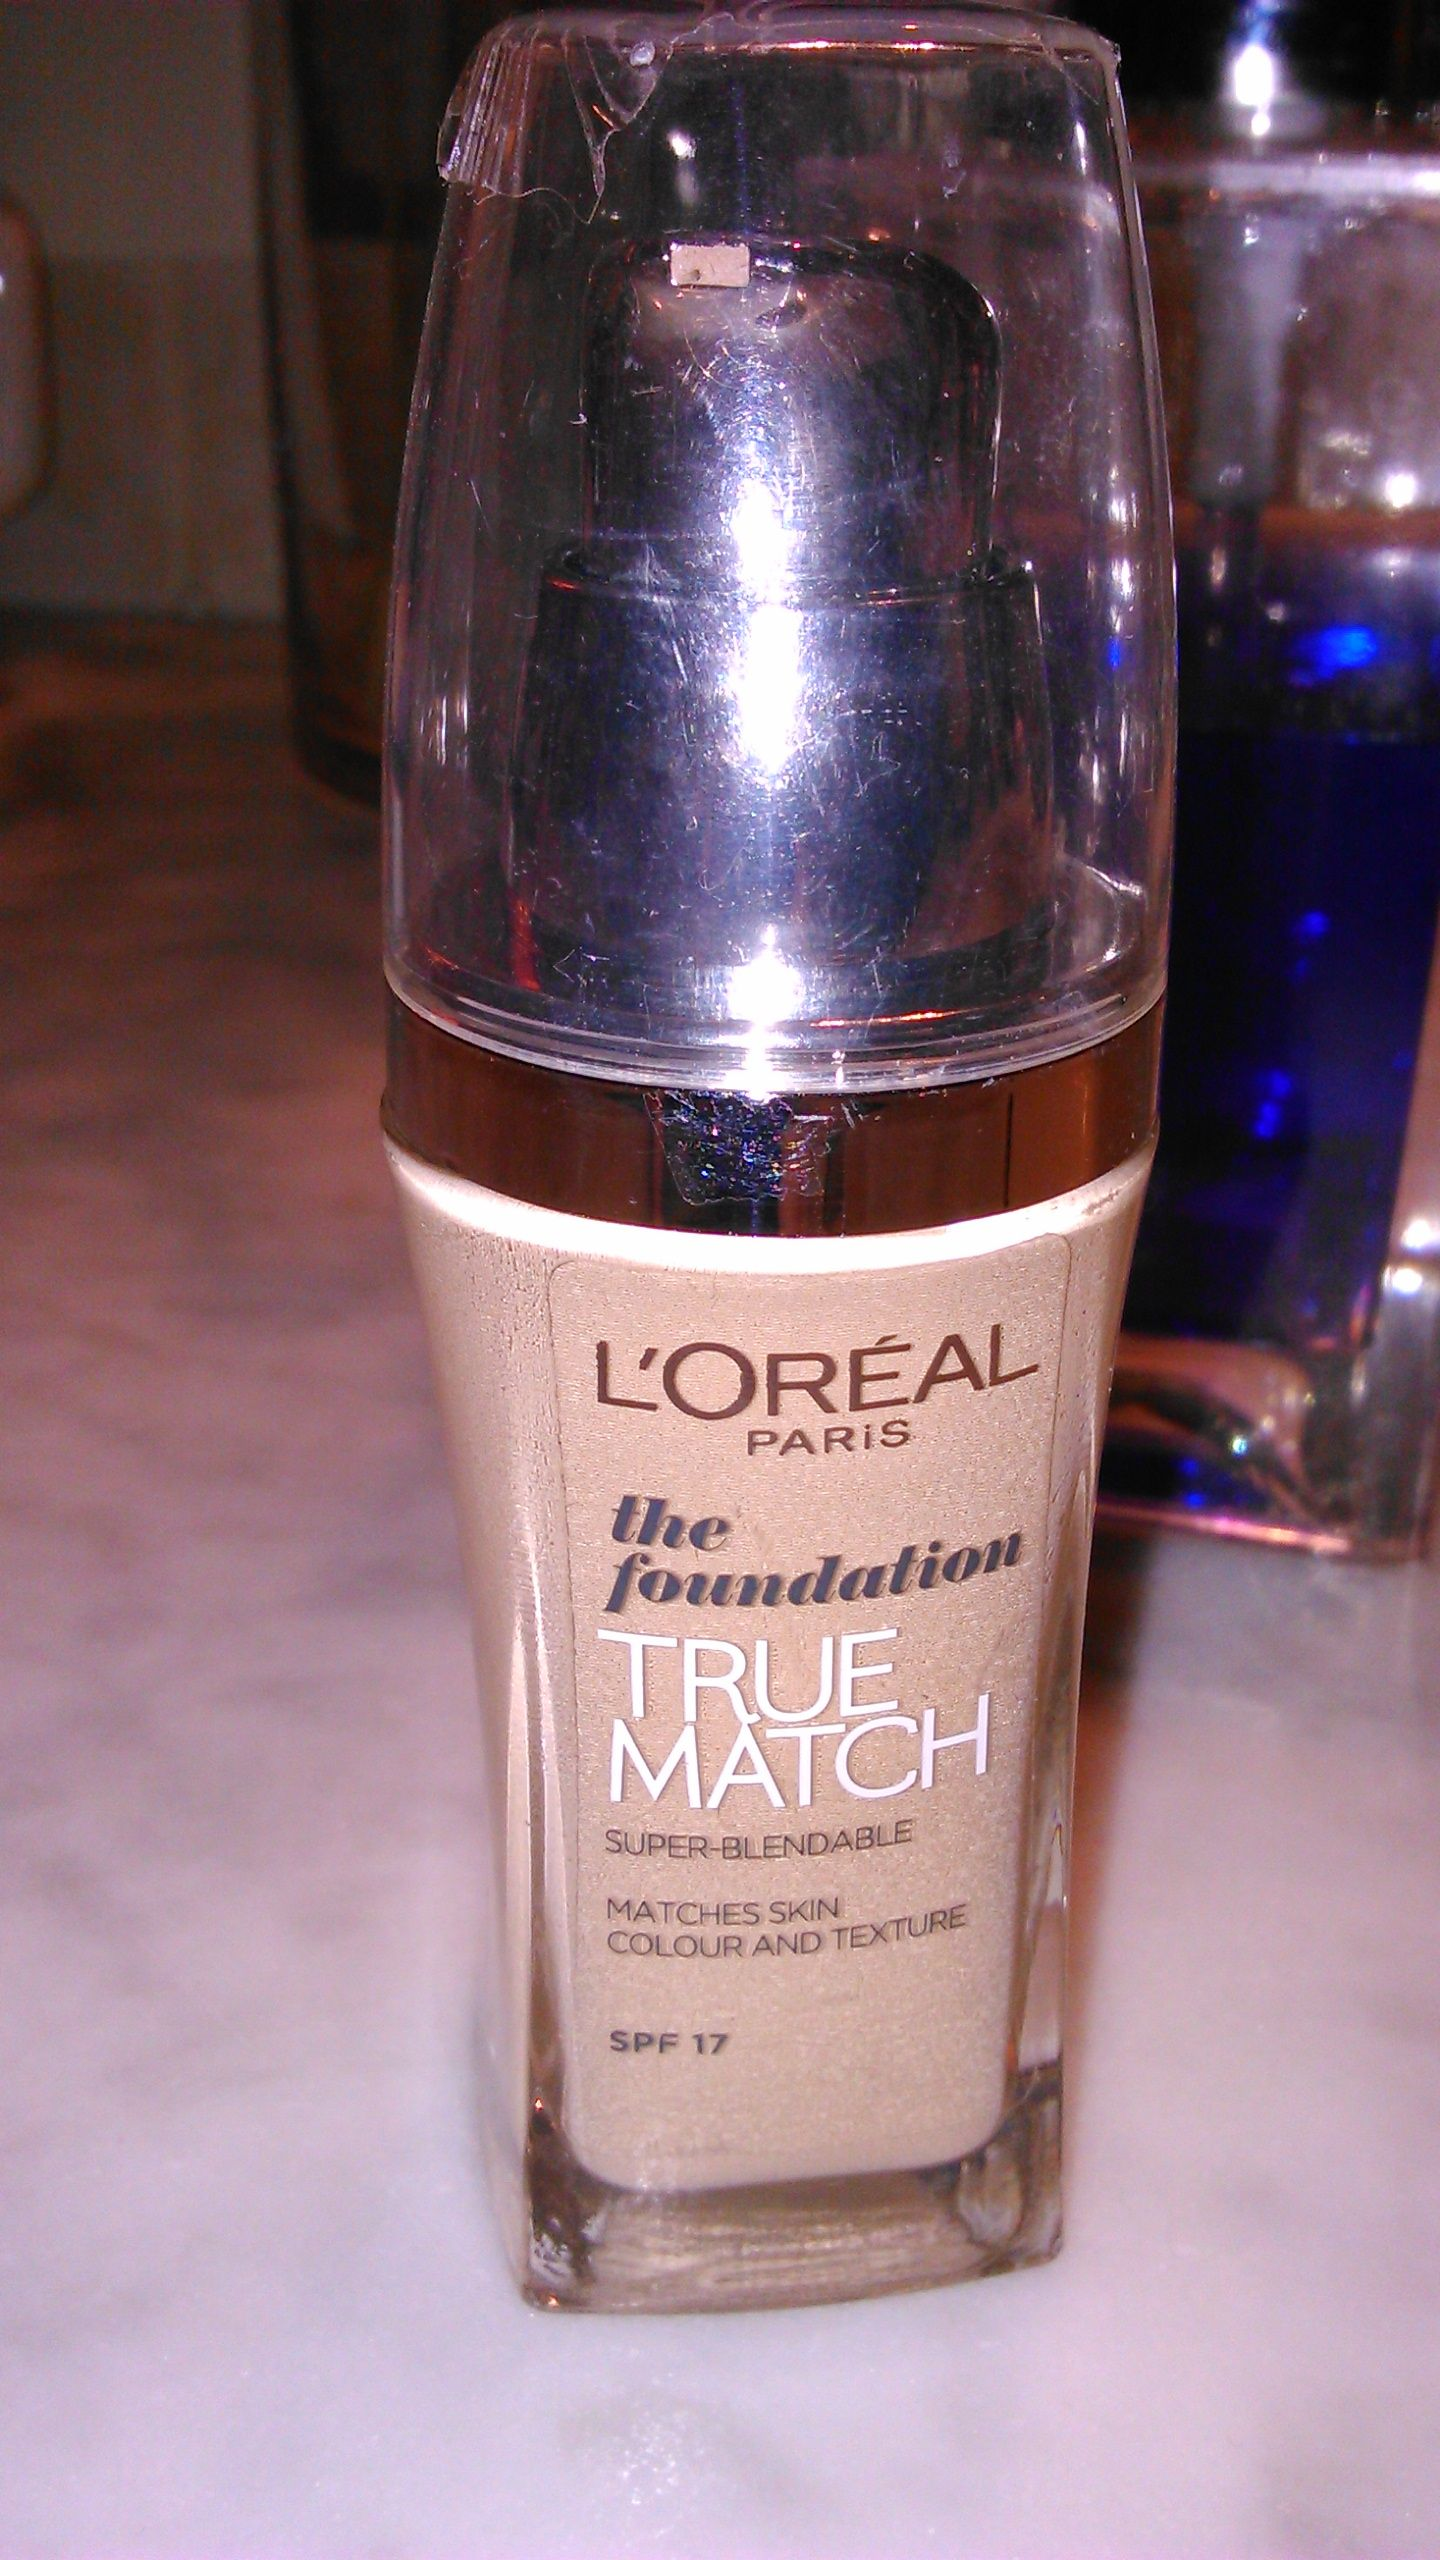 Super Blendable Makeup How to match foundation, No